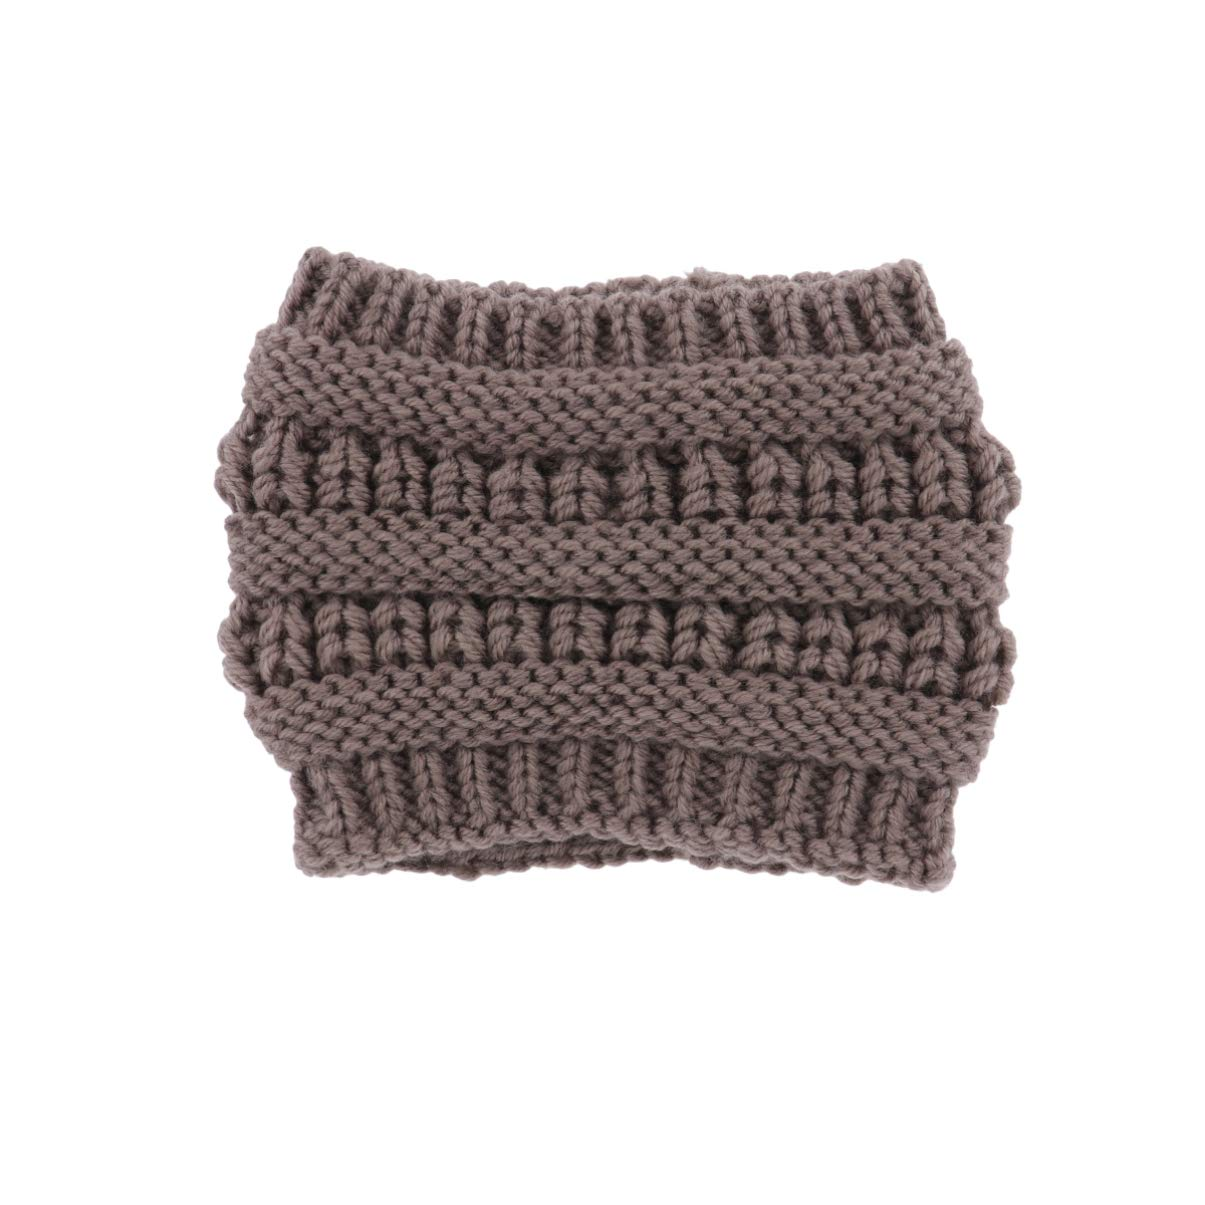 Lurrose Cable Knitted Headband Woolen Yarn Winter Elastic Crochet Hairband Turban Ear Warmer Headwrap Forehead Warmer Headwear for Women(Khaki)